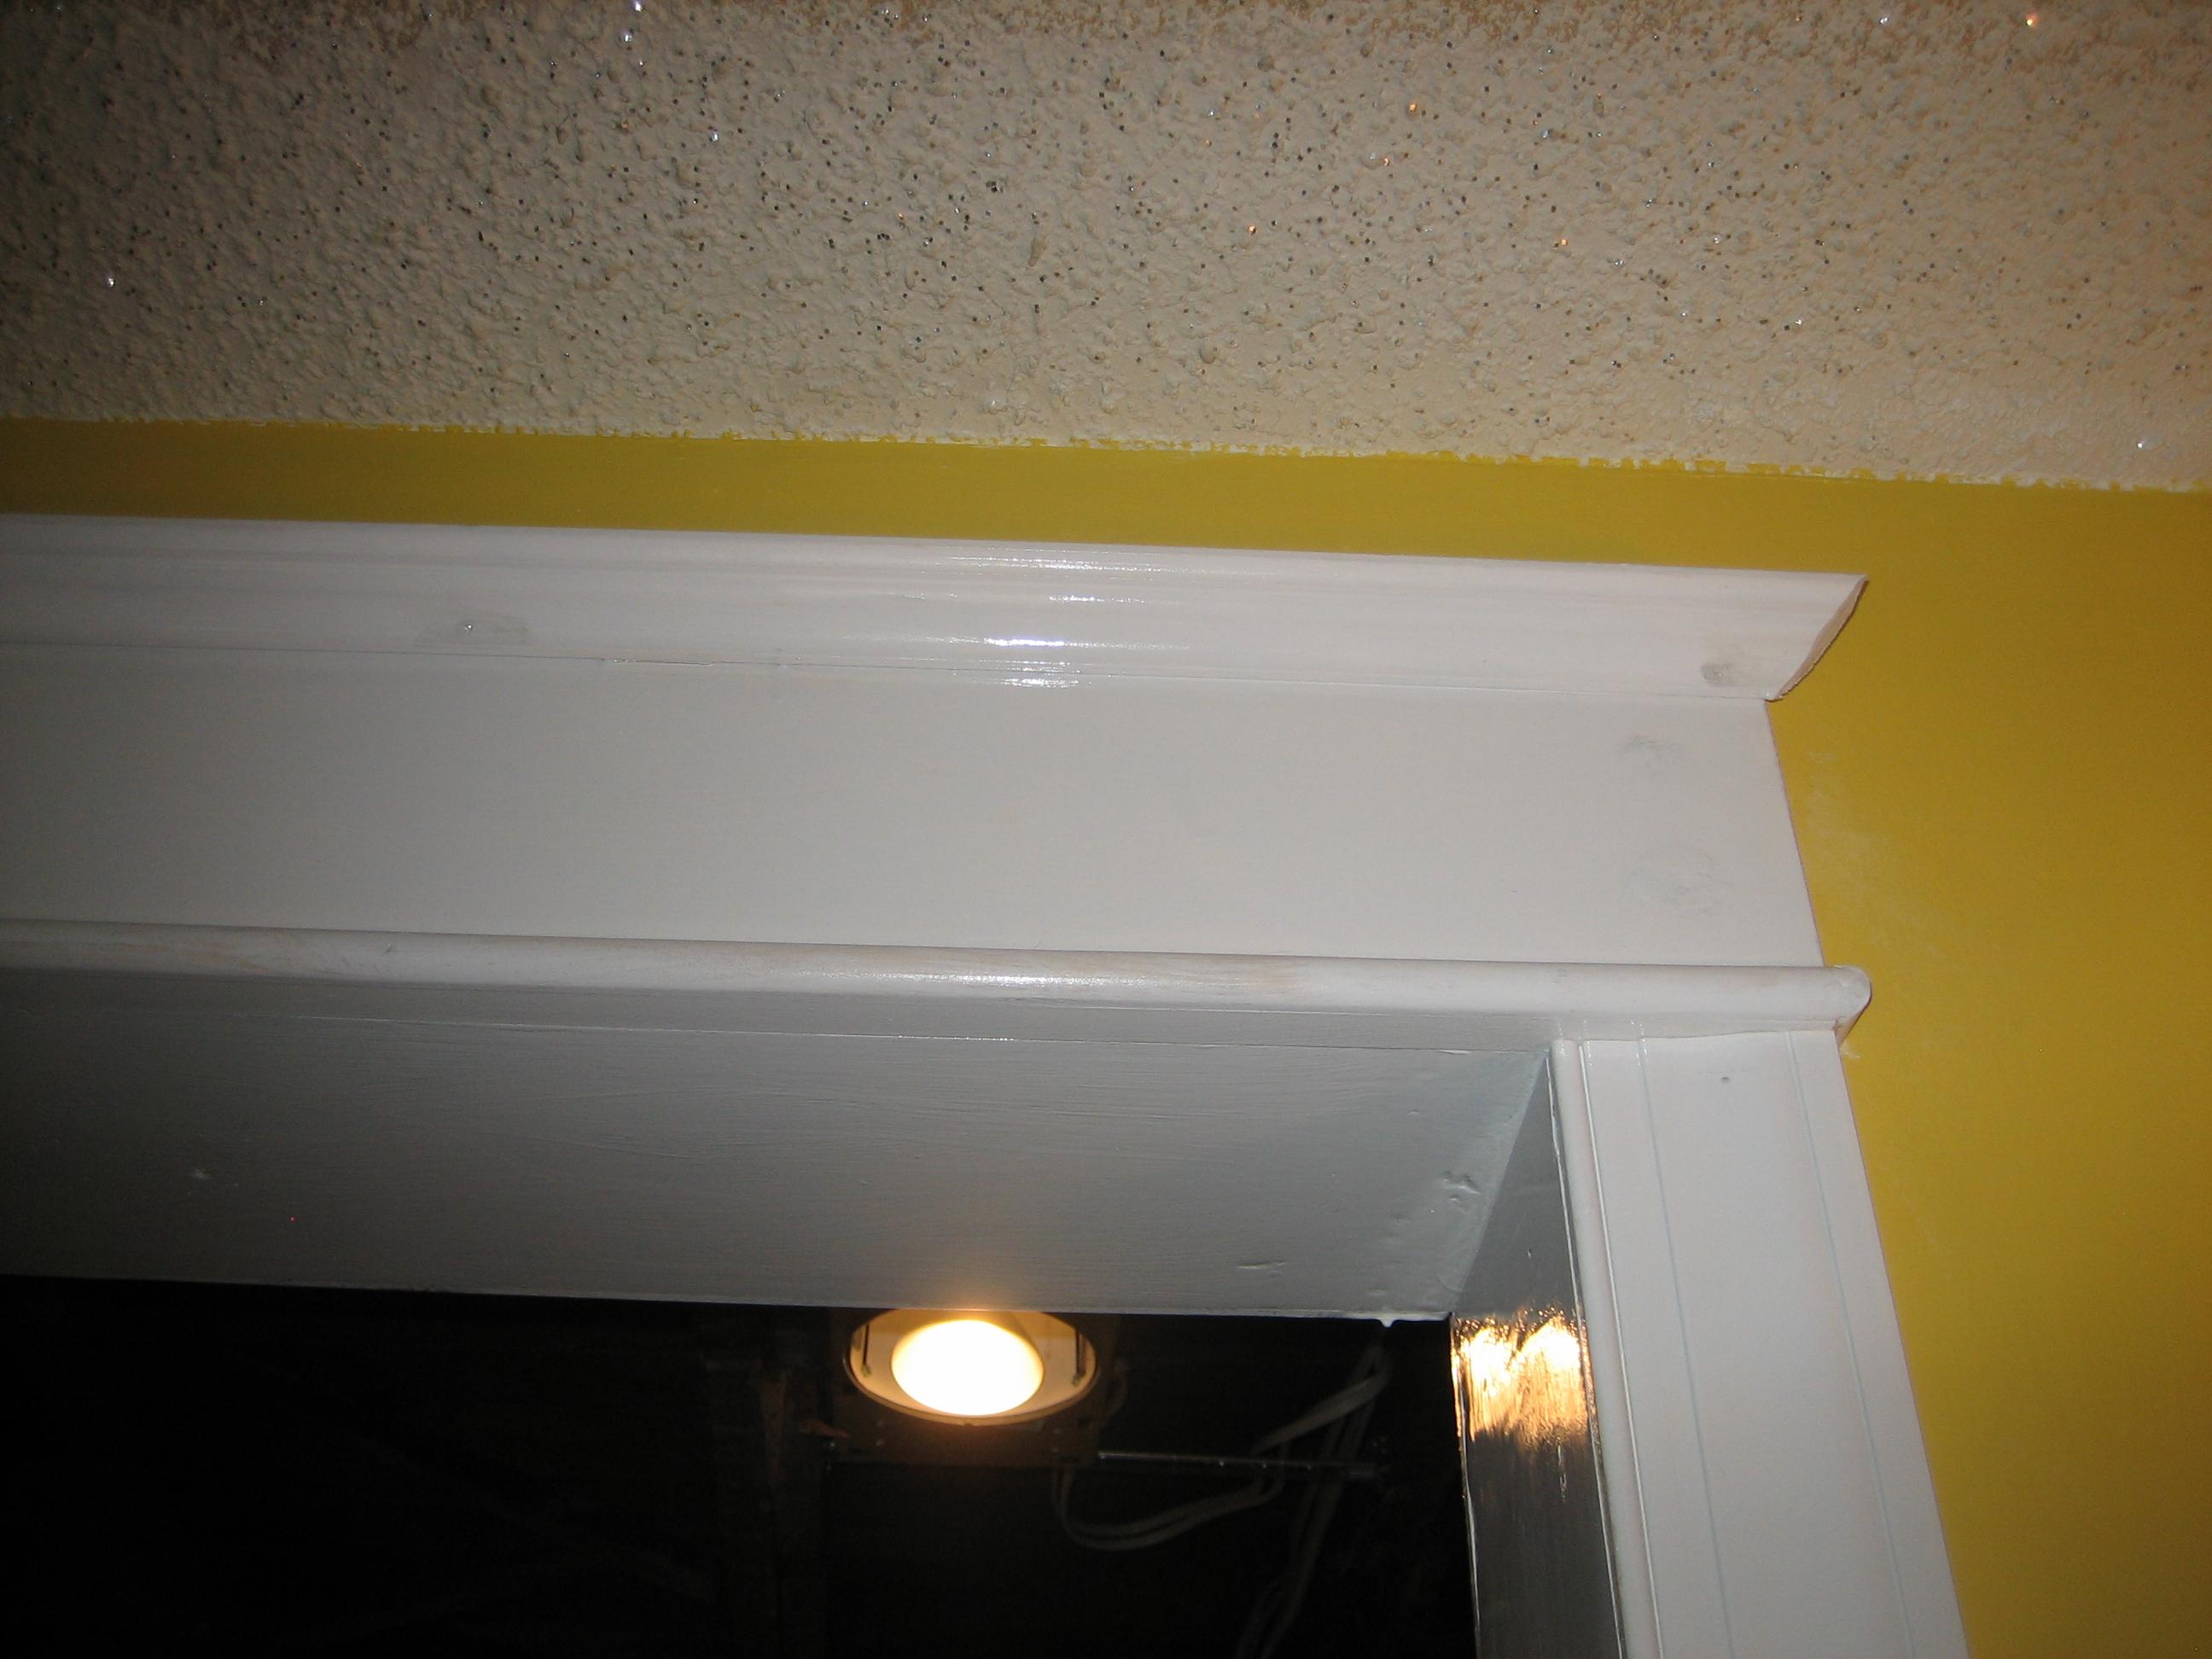 Cherry wood crown molding wallpaper border img 4346 2592x1944